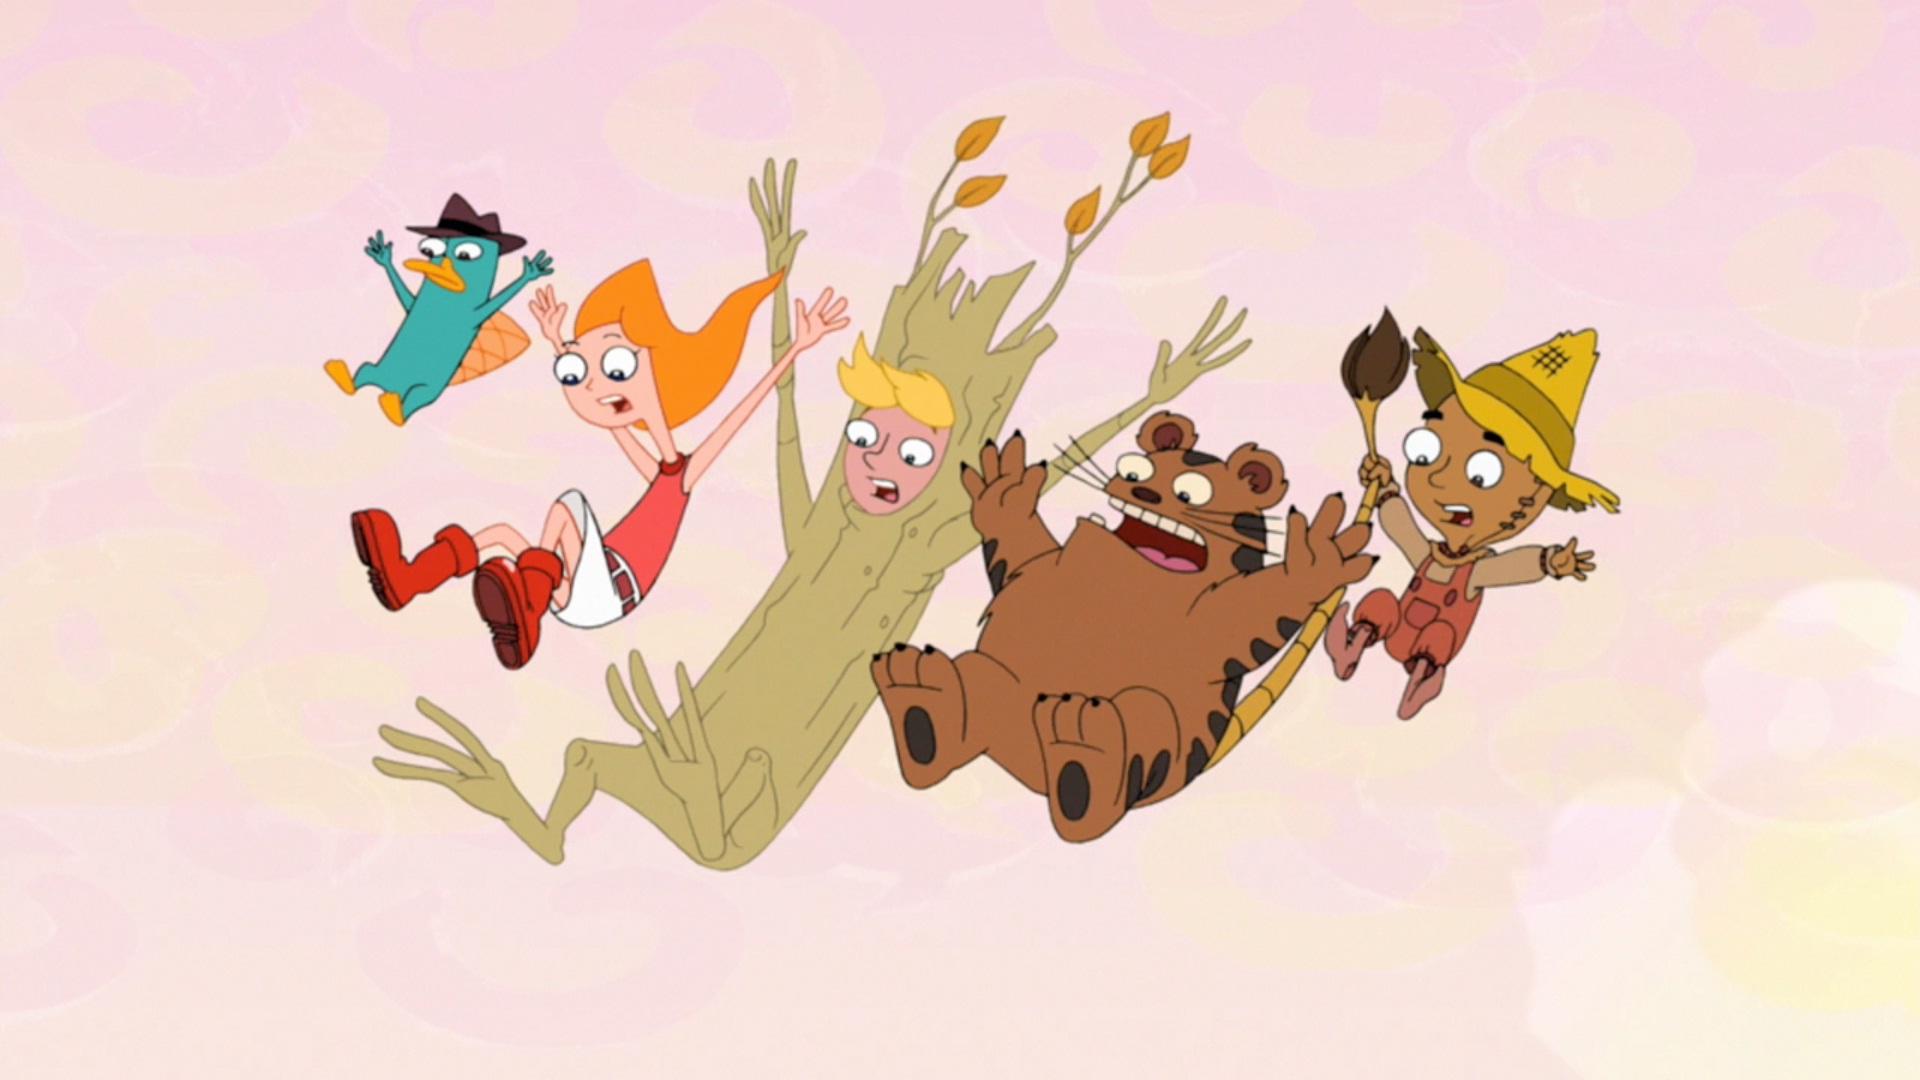 Wizard Of Odd Phineas And Ferb Wiki Fandom